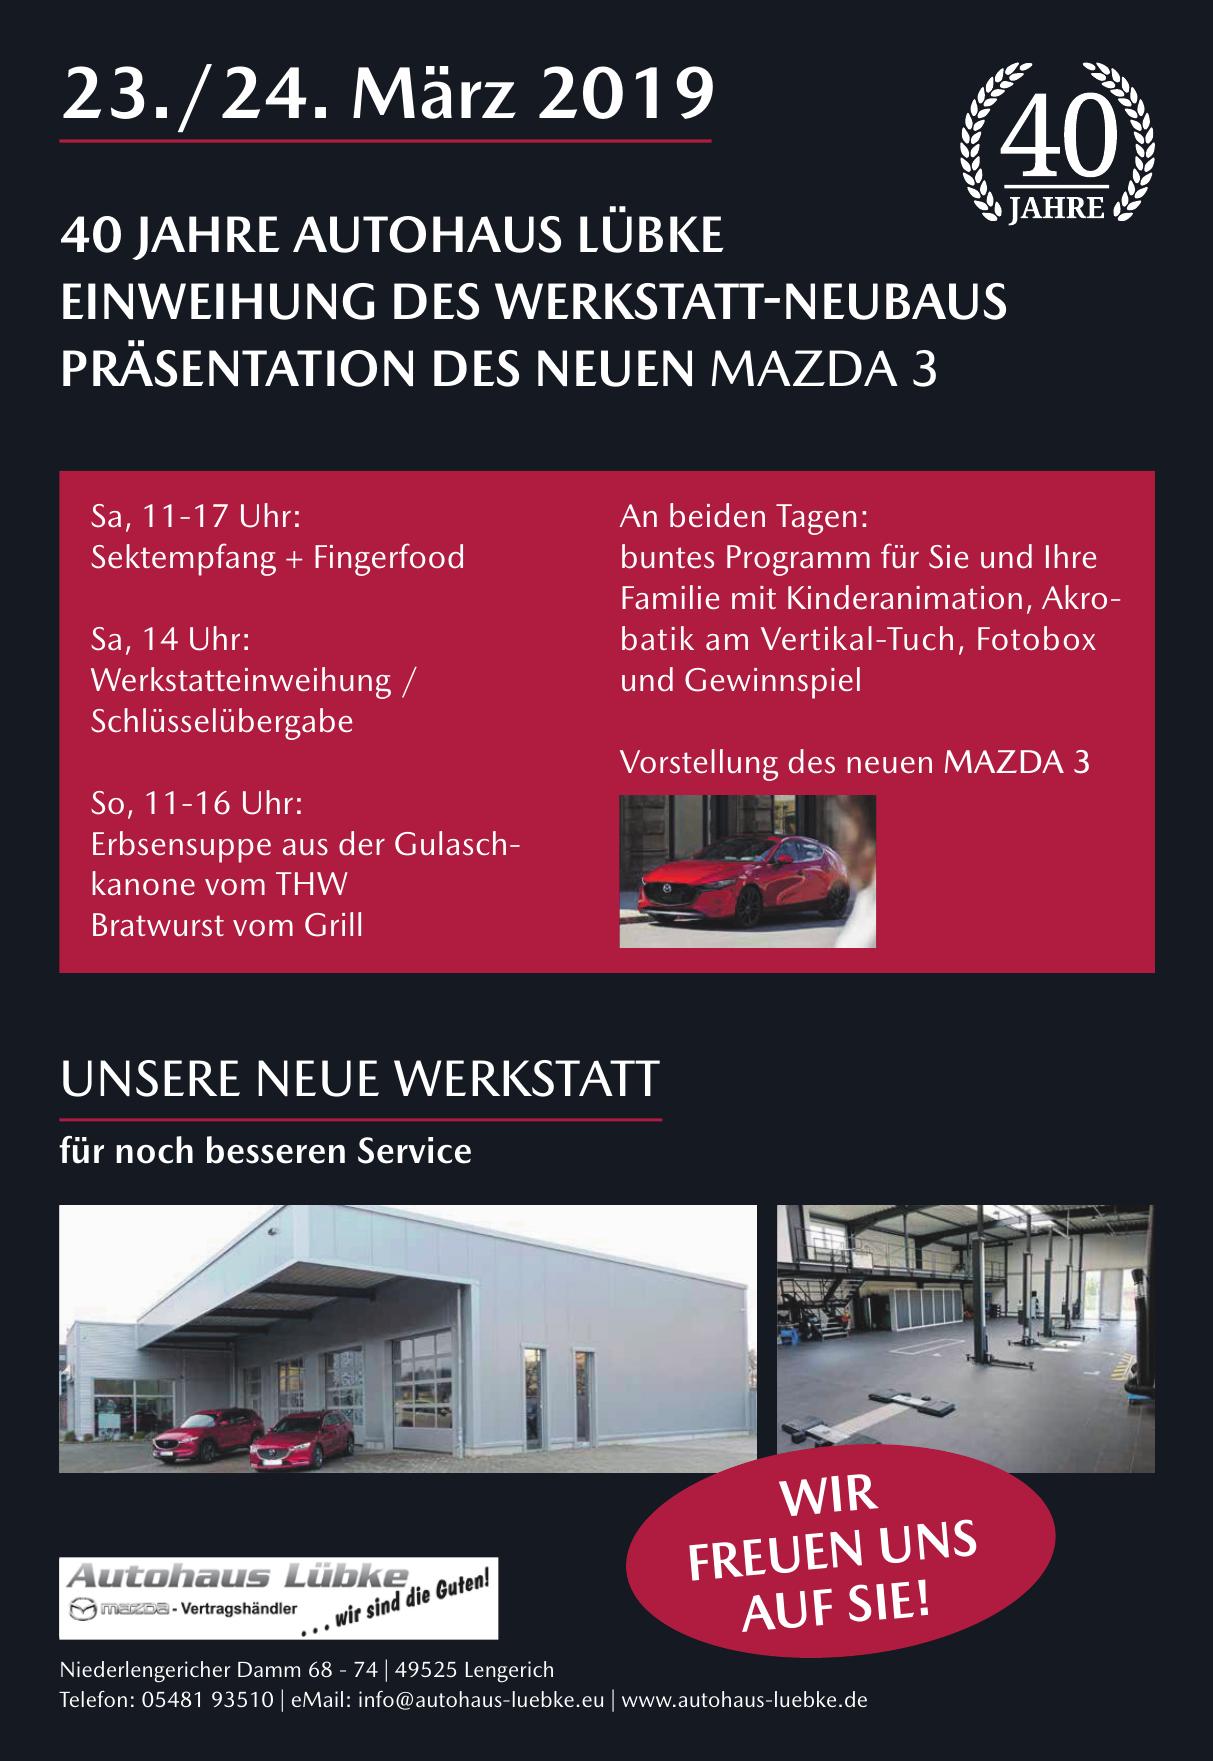 Autohaus Lübke